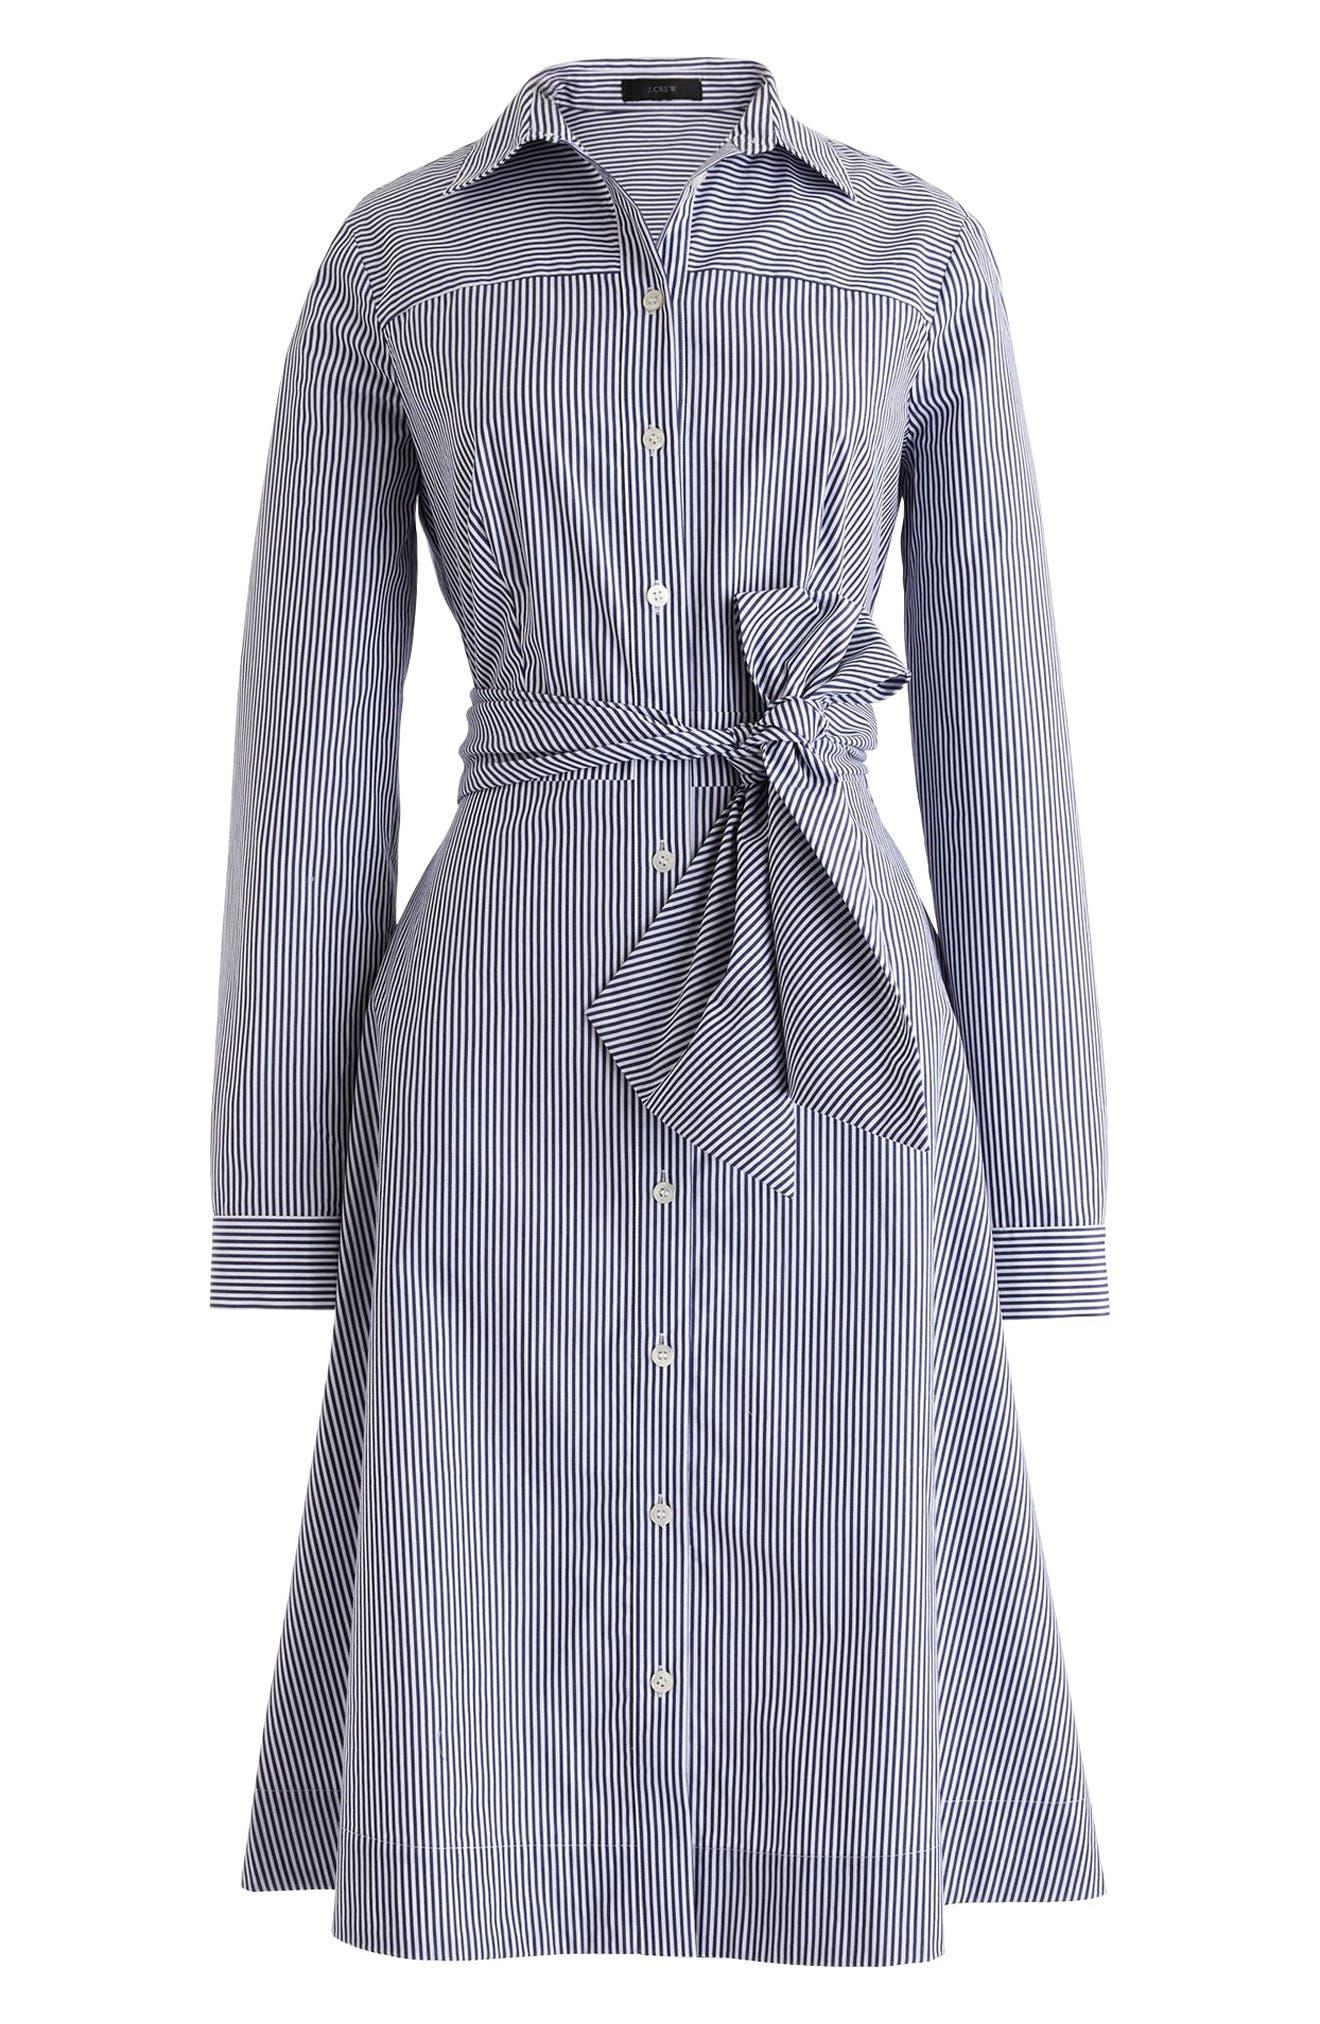 Alternate Image 3  - J.Crew Maribou Stripe Cotton Shirtdress (Regular & Petite)